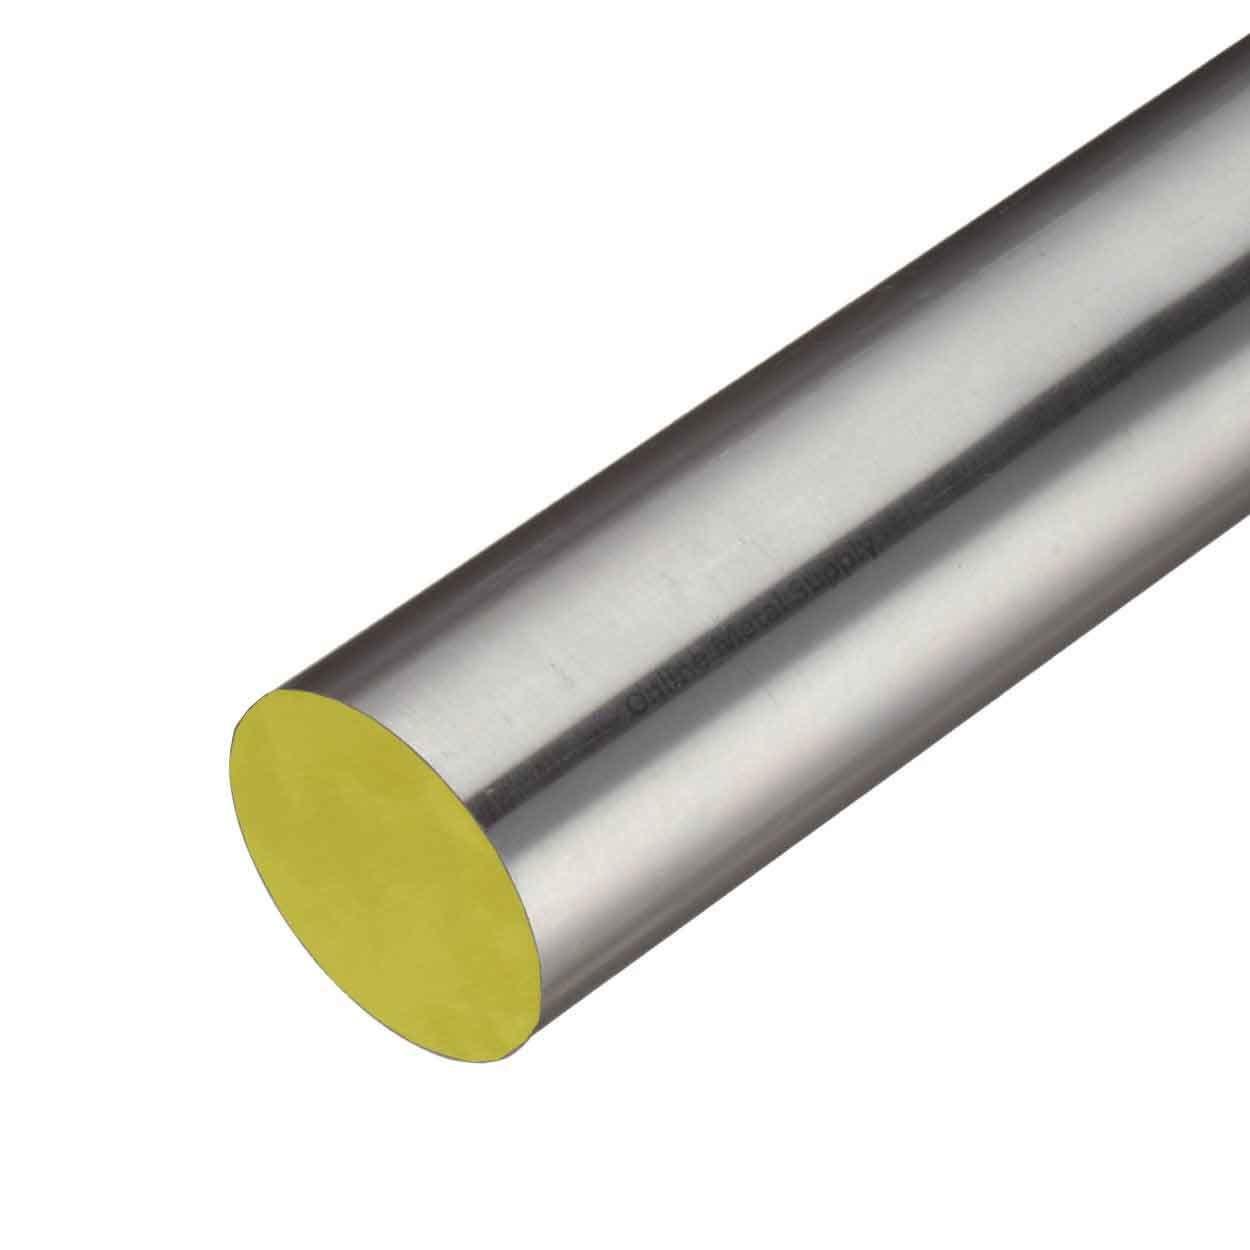 Online Metal Supply 316 Stainless Steel Round Rod, 1.625 (1-5/8 inch) x 18 inches by Online Metal Supply